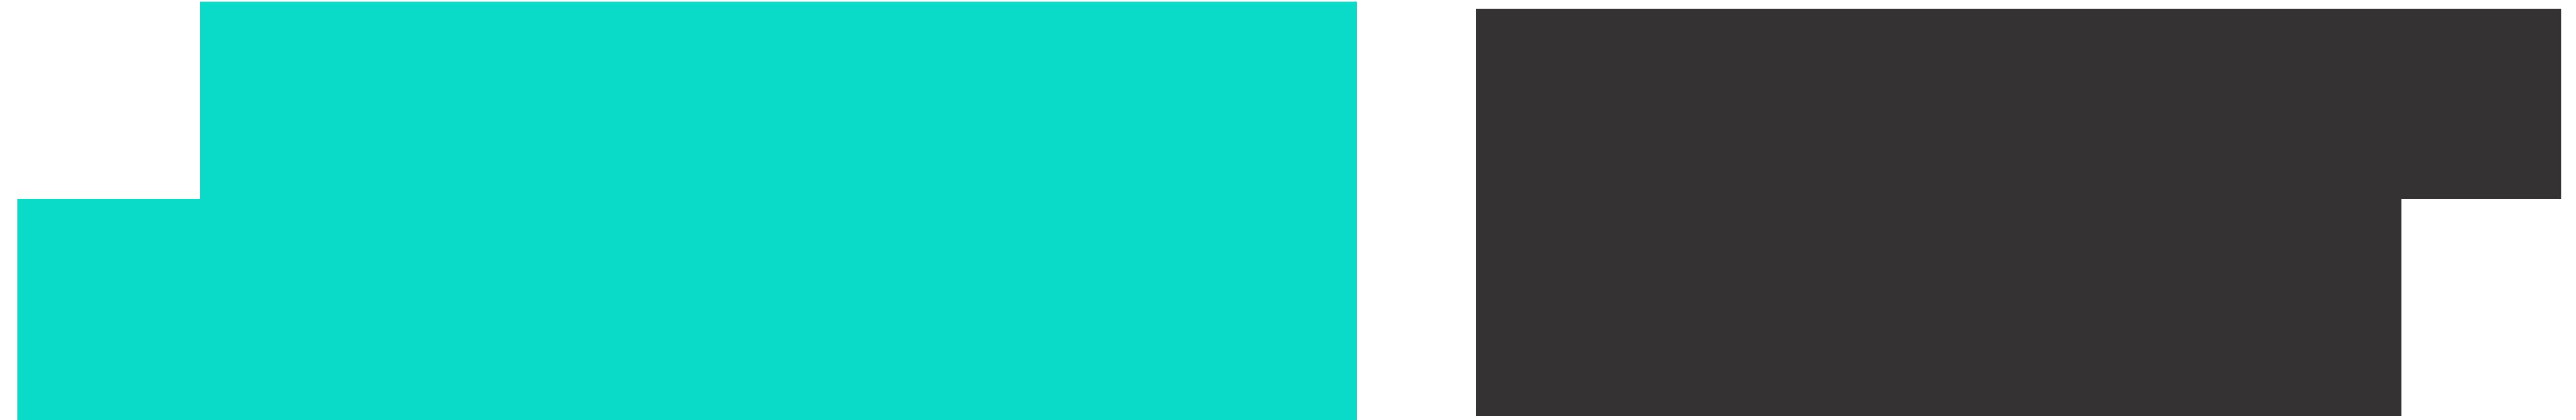 logo jose accelerated